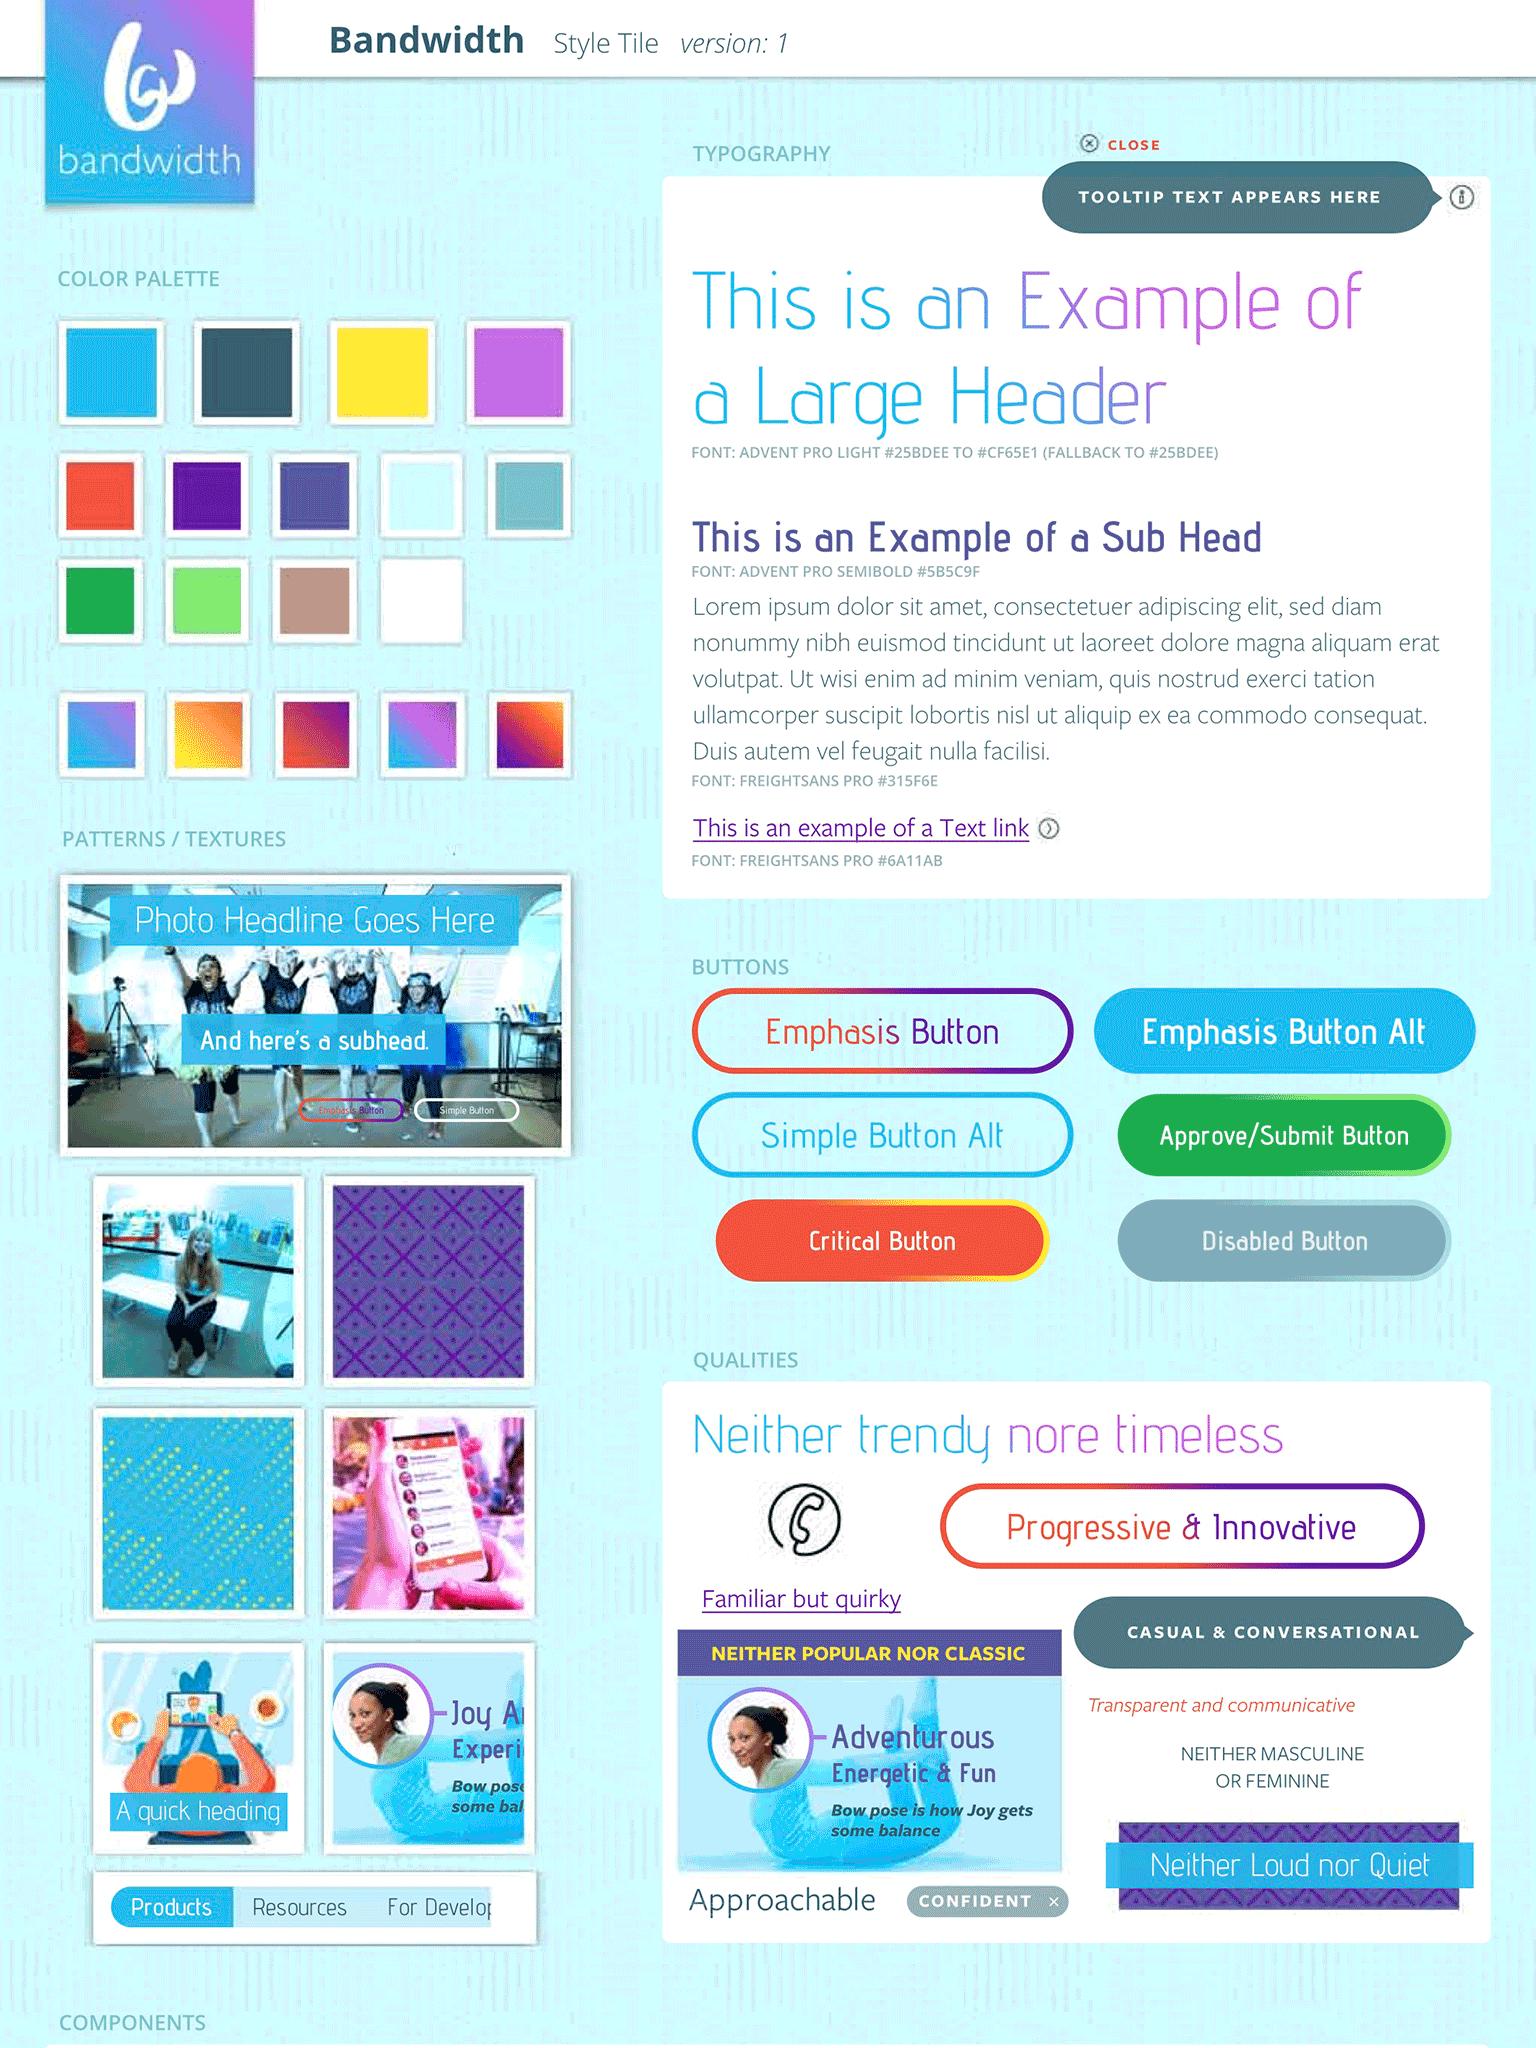 Bandwidth Style Tile final design comp